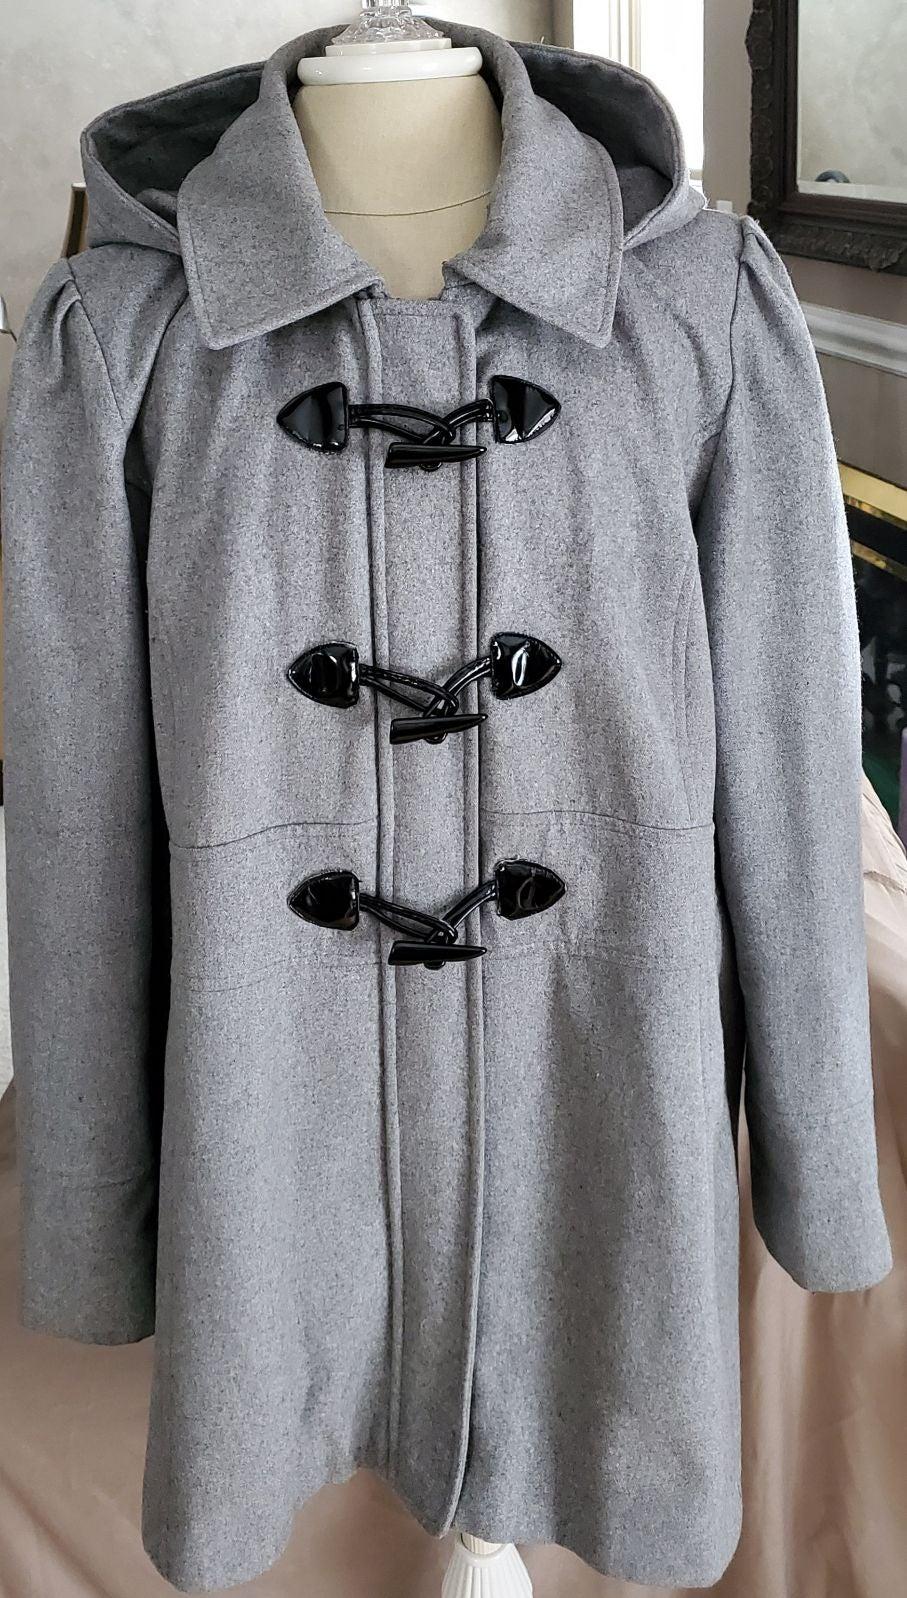 Guess‼️WOOL‼️ Pea Coat gray/ black, 1X